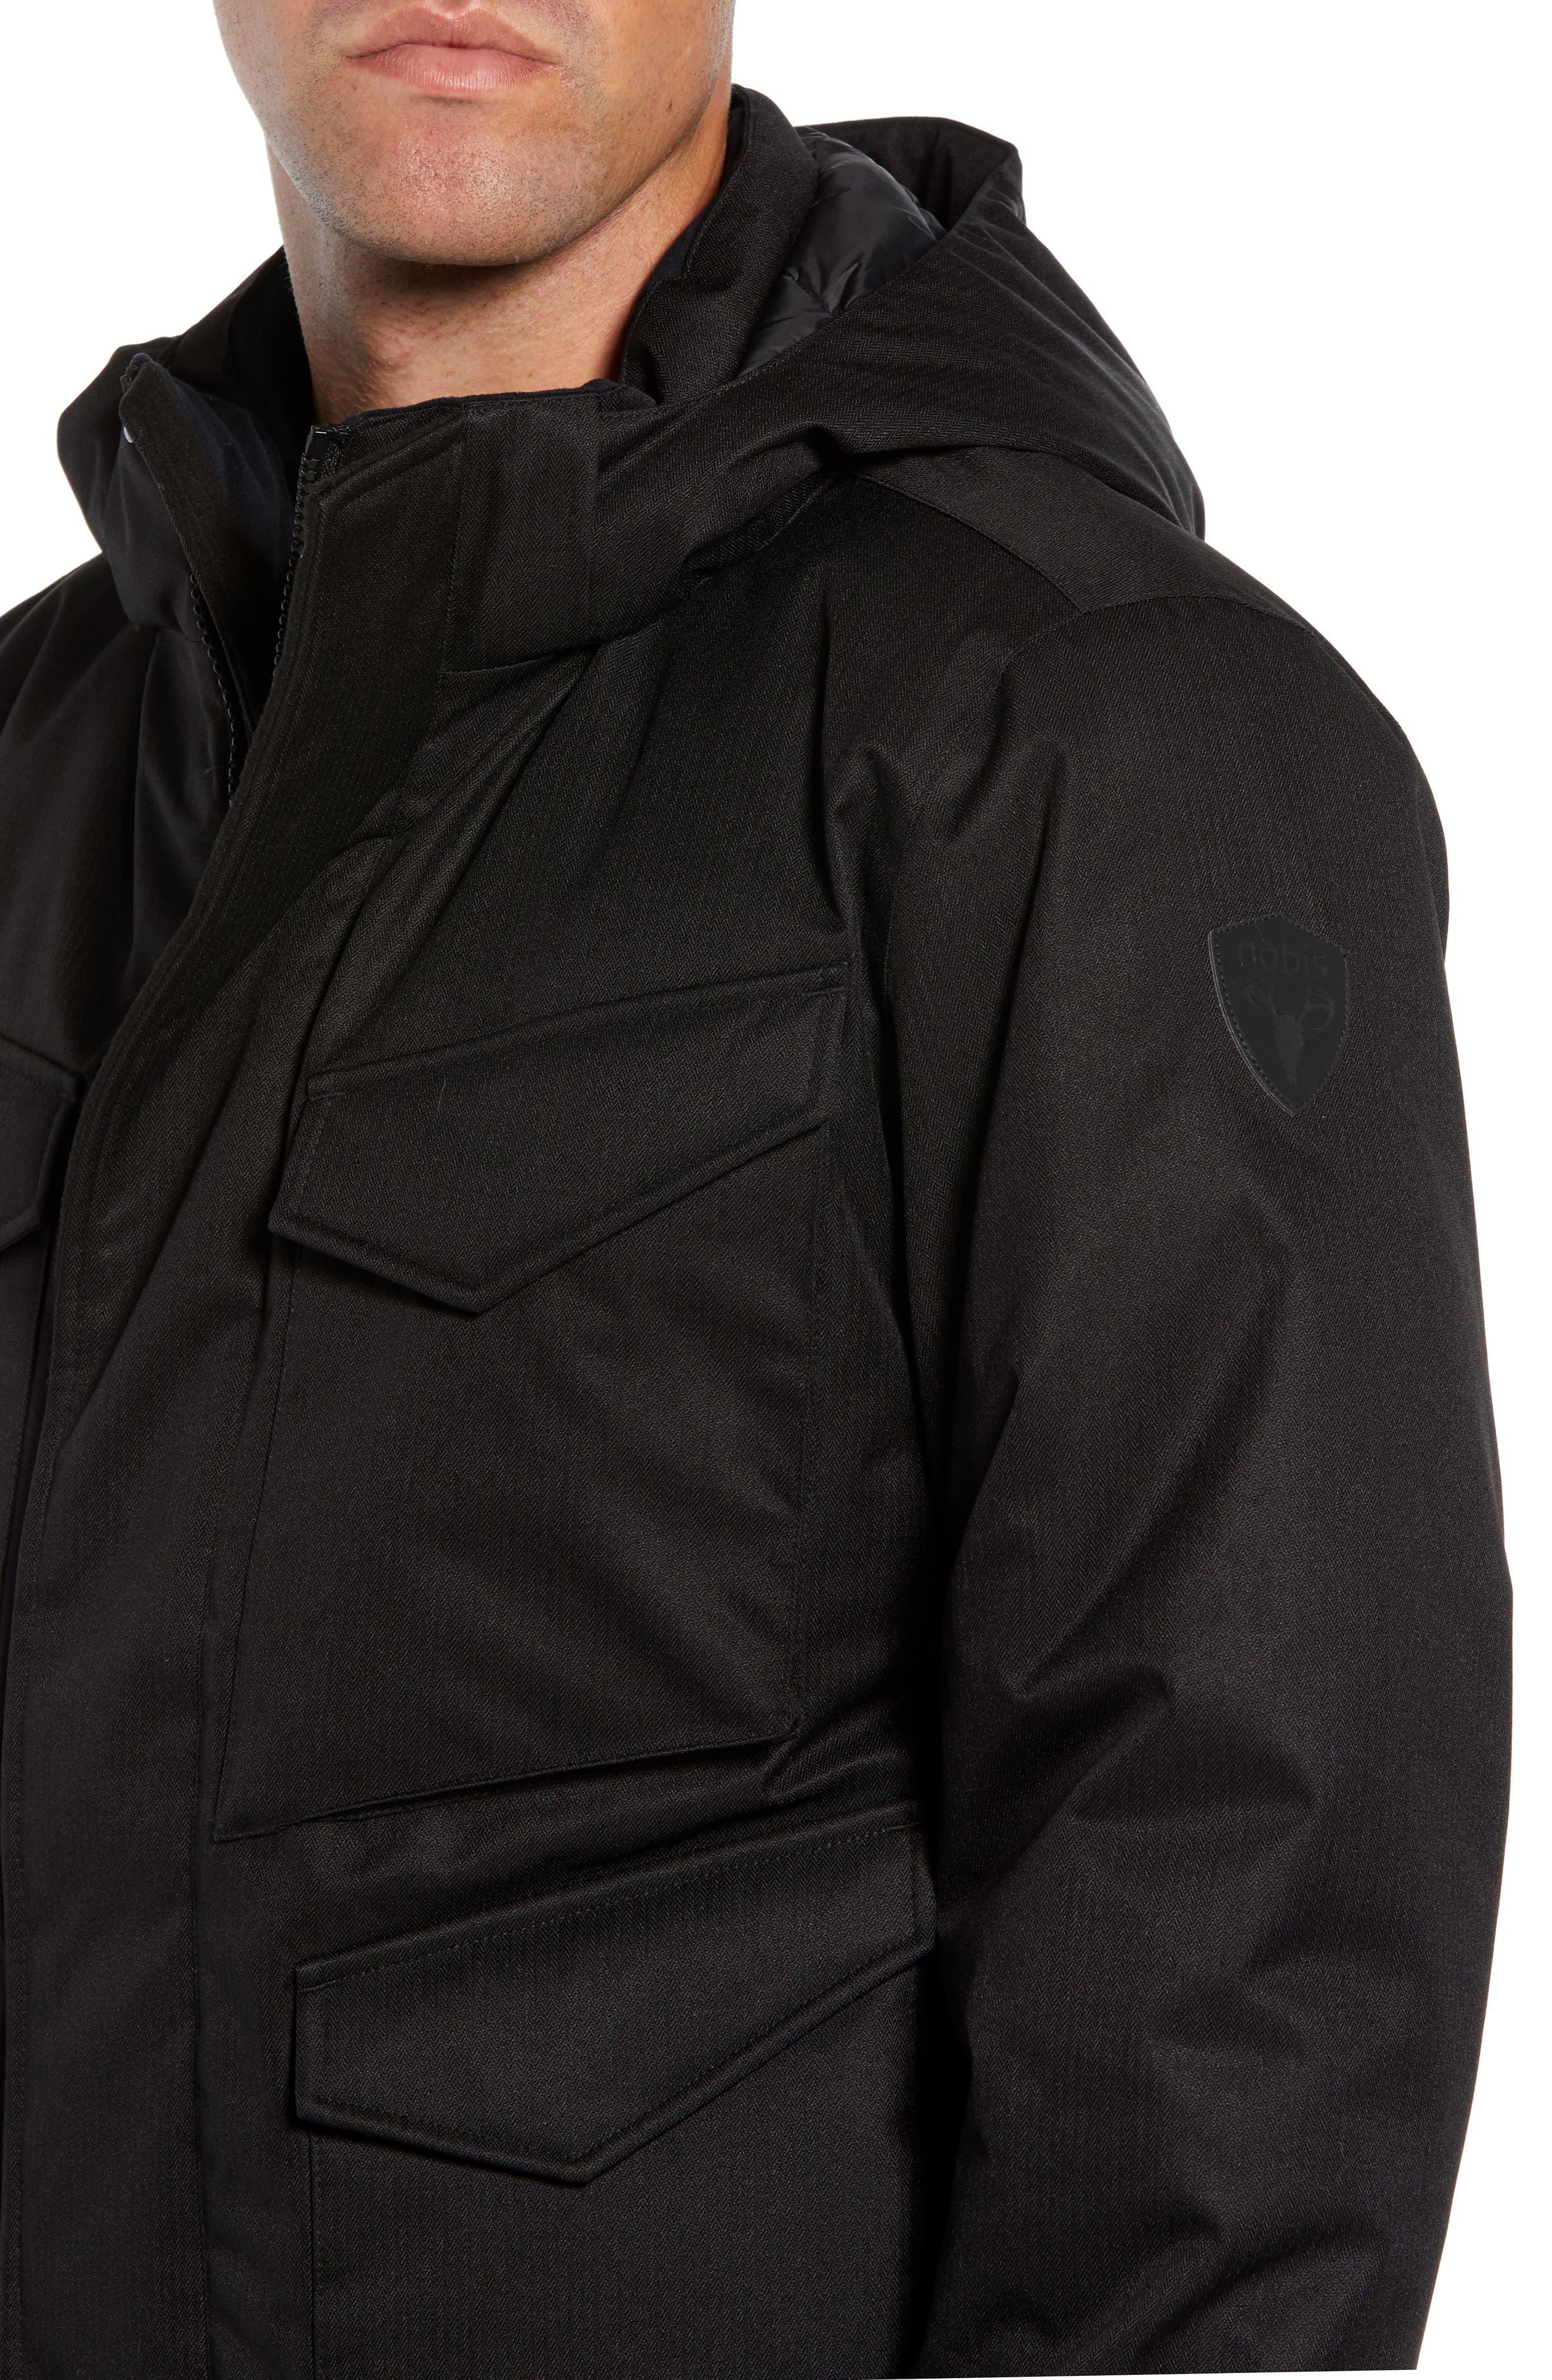 Ash Windproof & Waterproof 650 Fill Power Down Bomber Jacket,                             Alternate thumbnail 4, color,                             BLACK